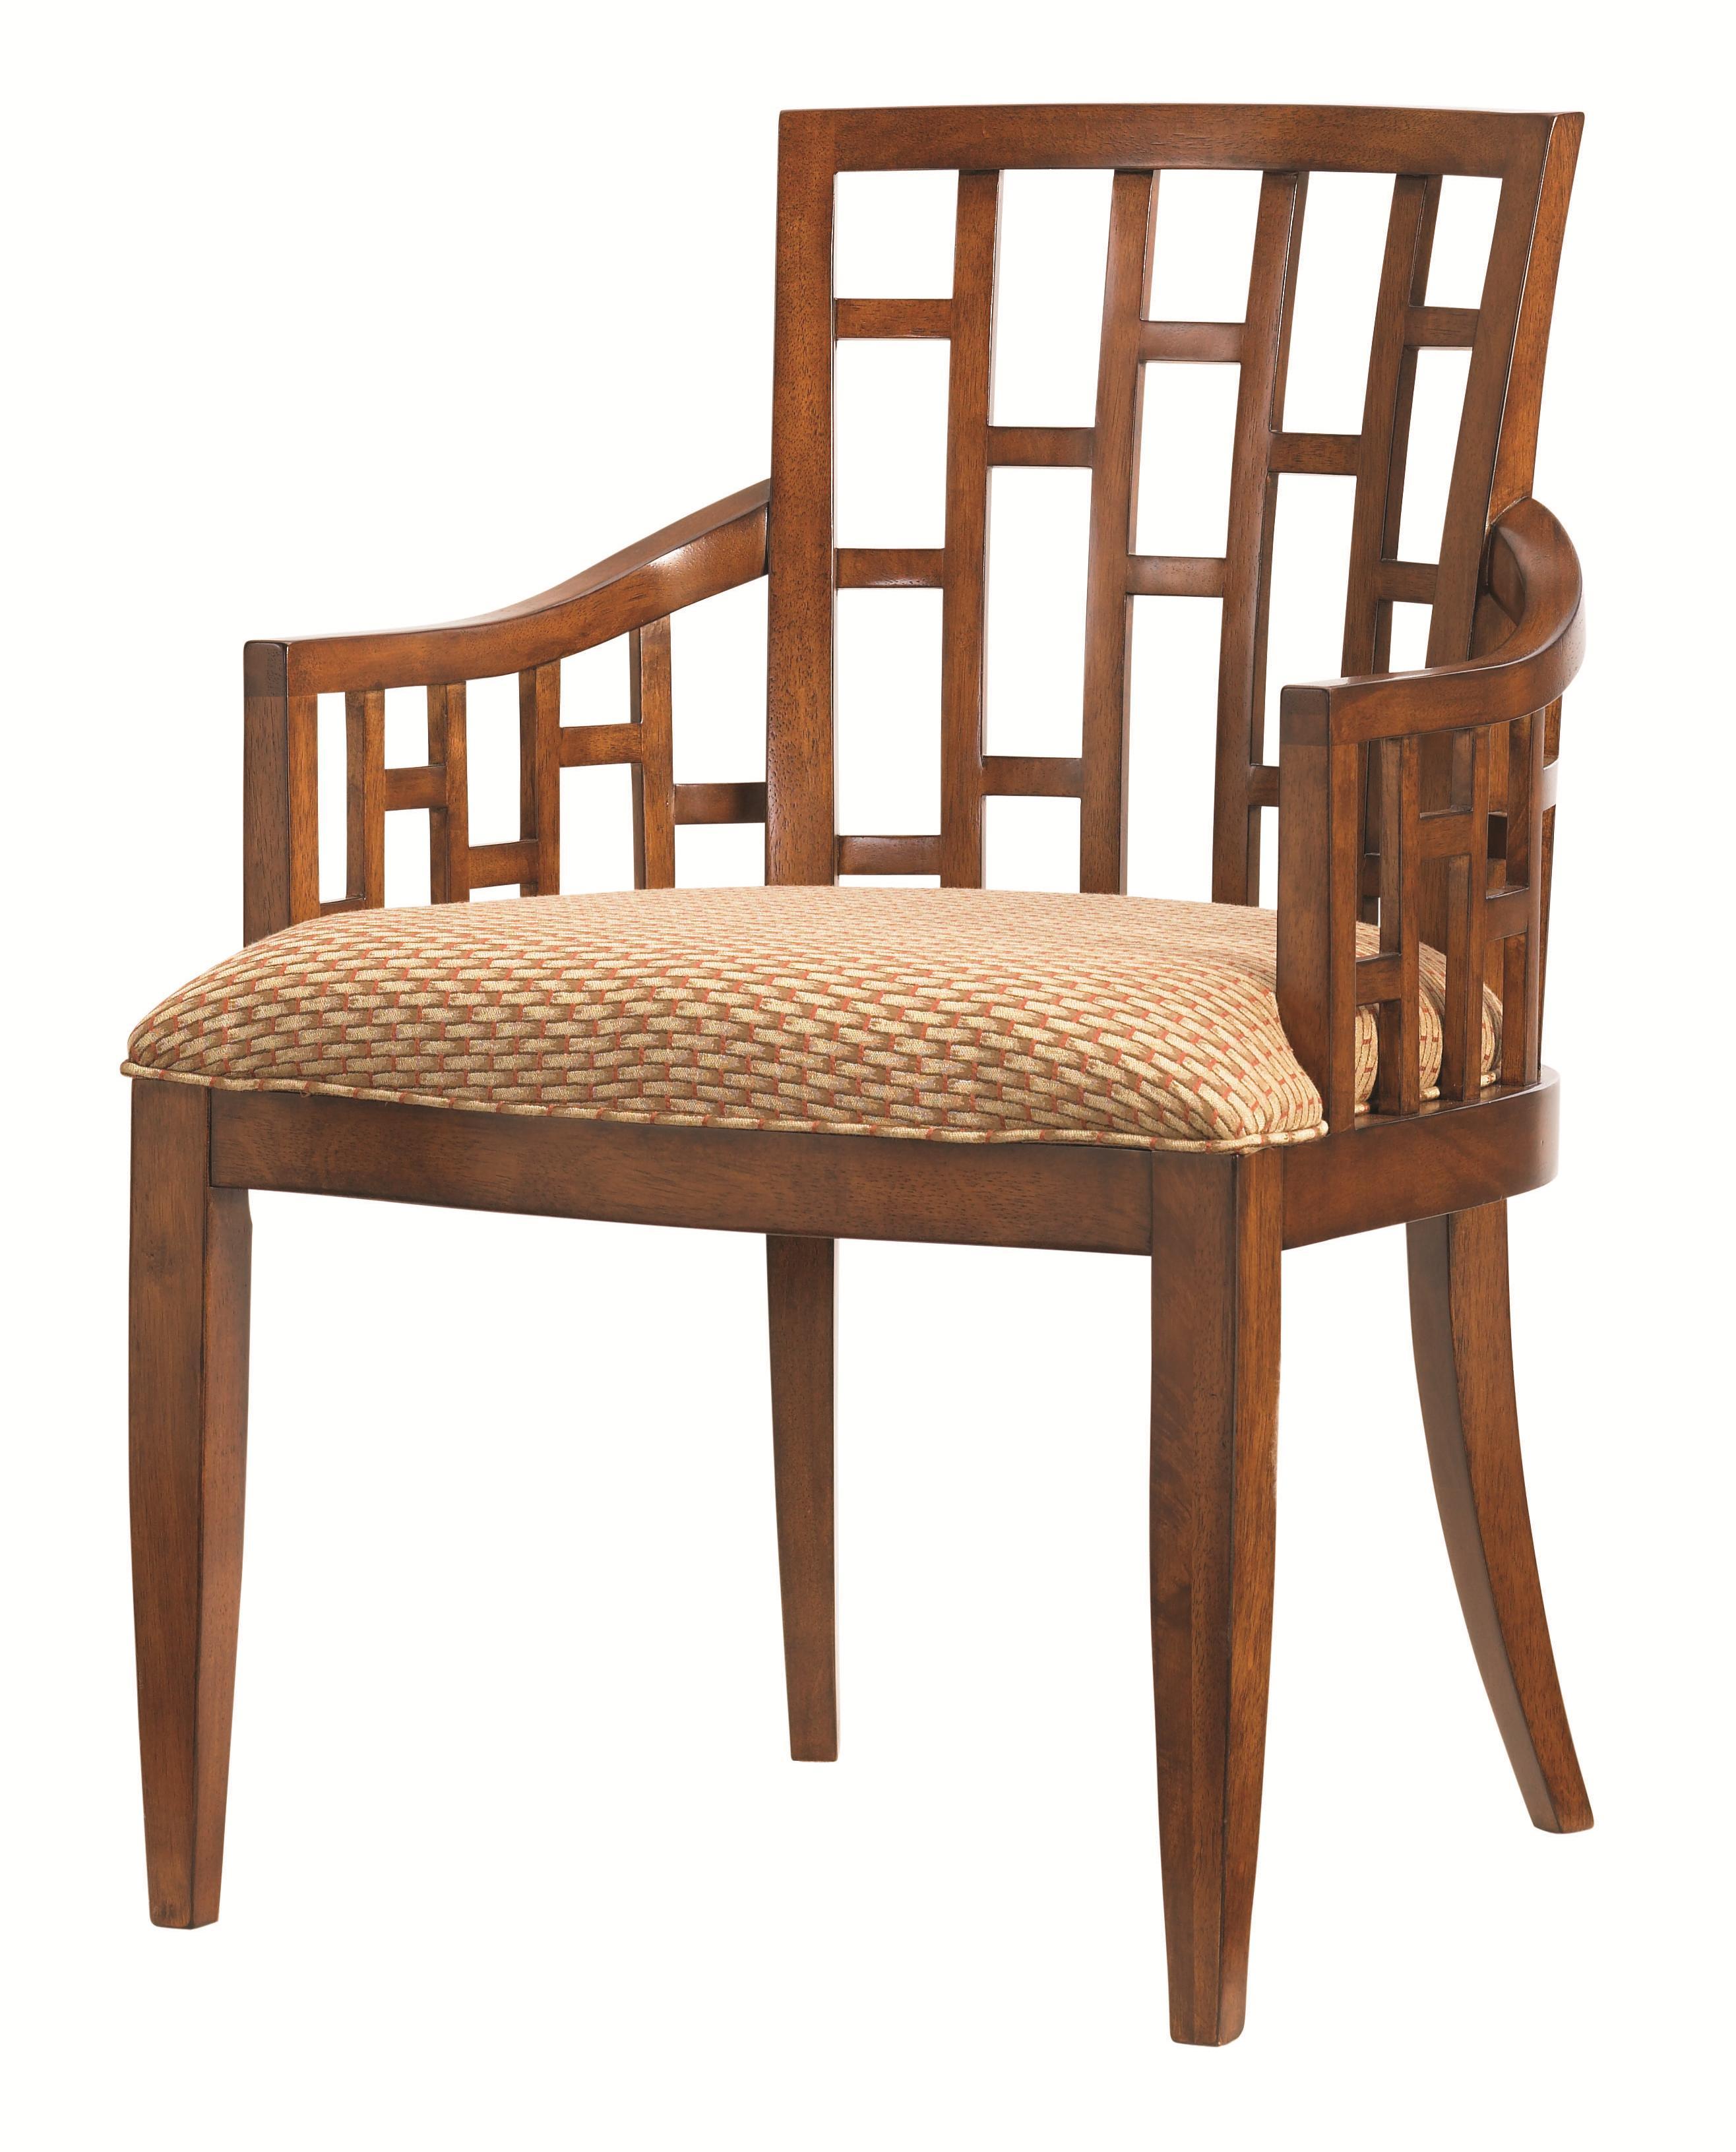 Ocean Club <b>Quick Ship</b> Lanai Arm Chair by Tommy Bahama Home at Baer's Furniture